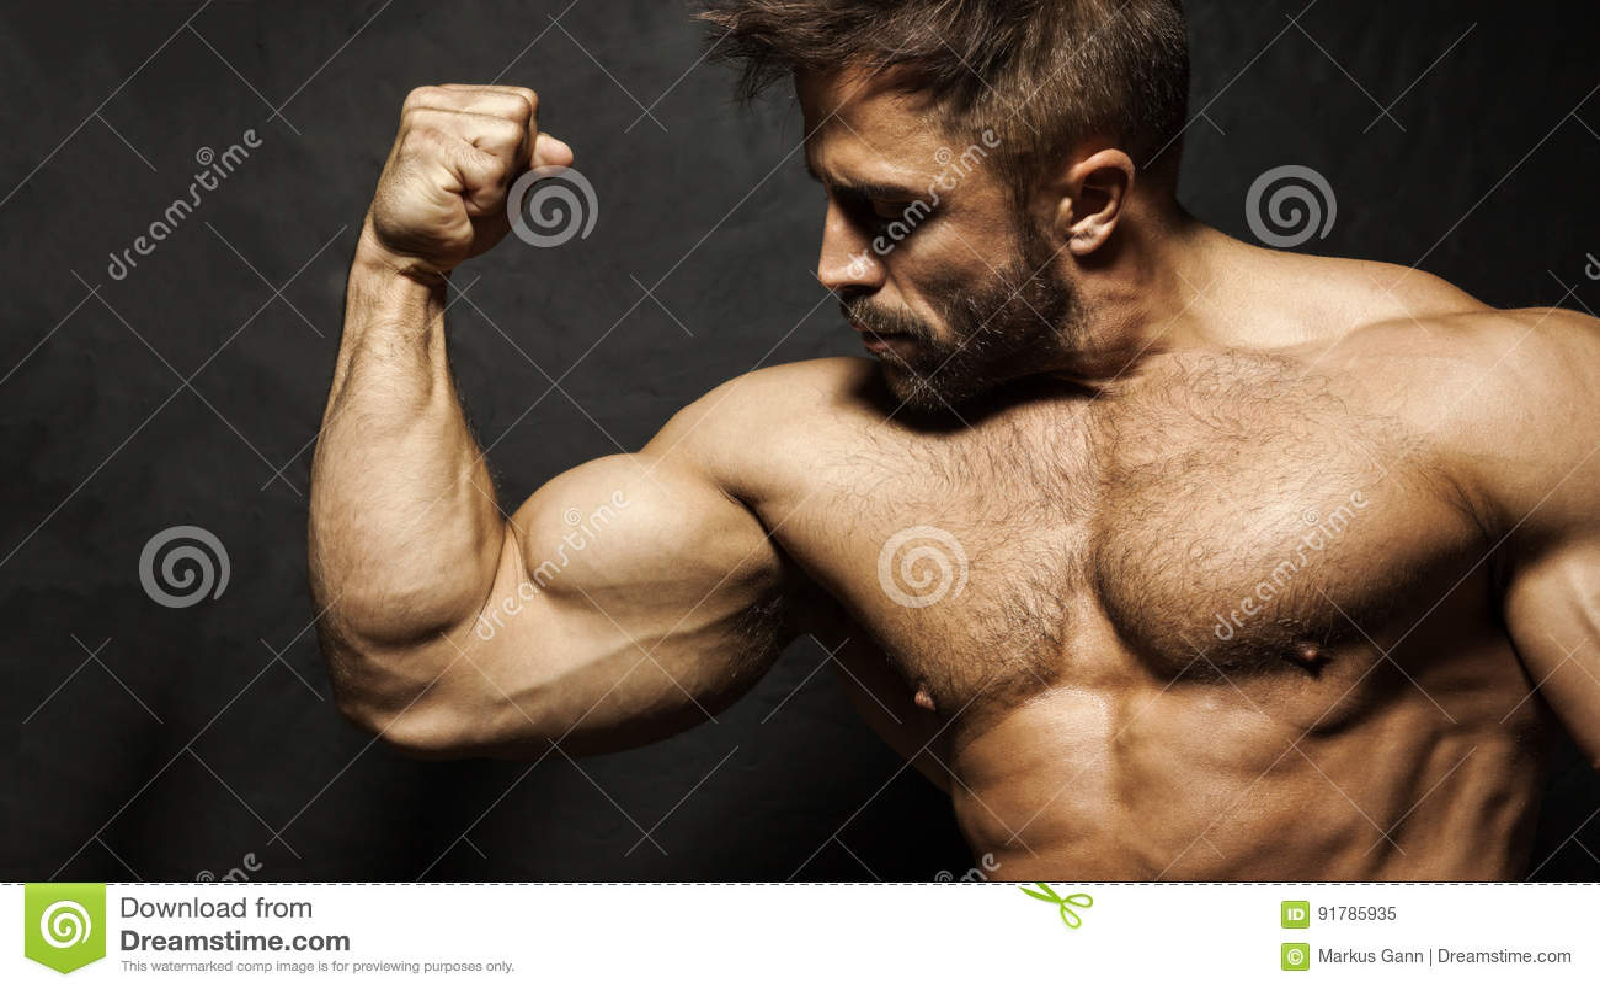 A muscular man flexing his biceps